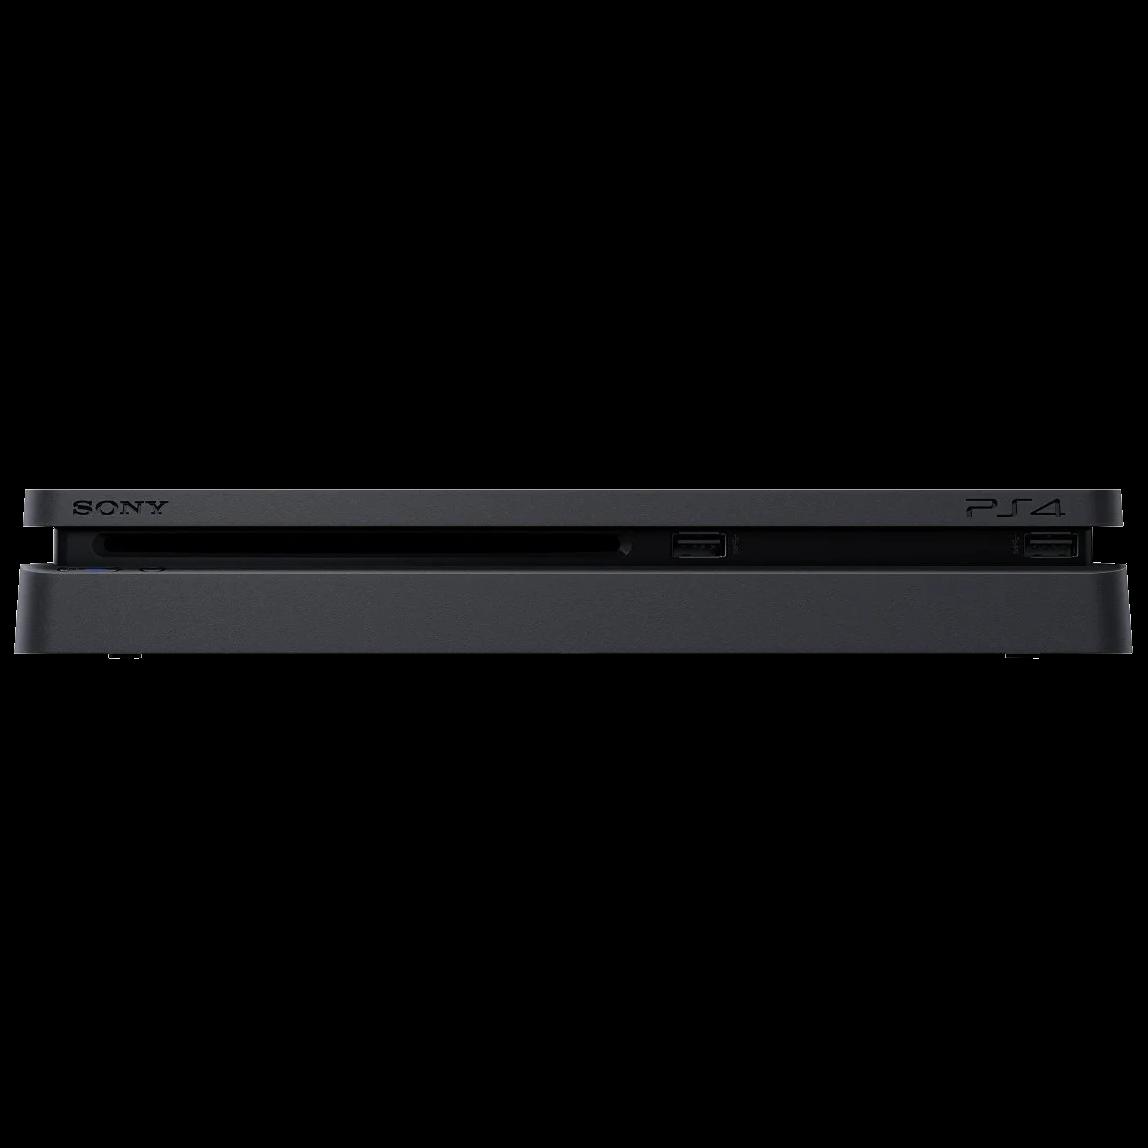 PlayStation4 1TB + 3 Games + PS Plus Black - 5